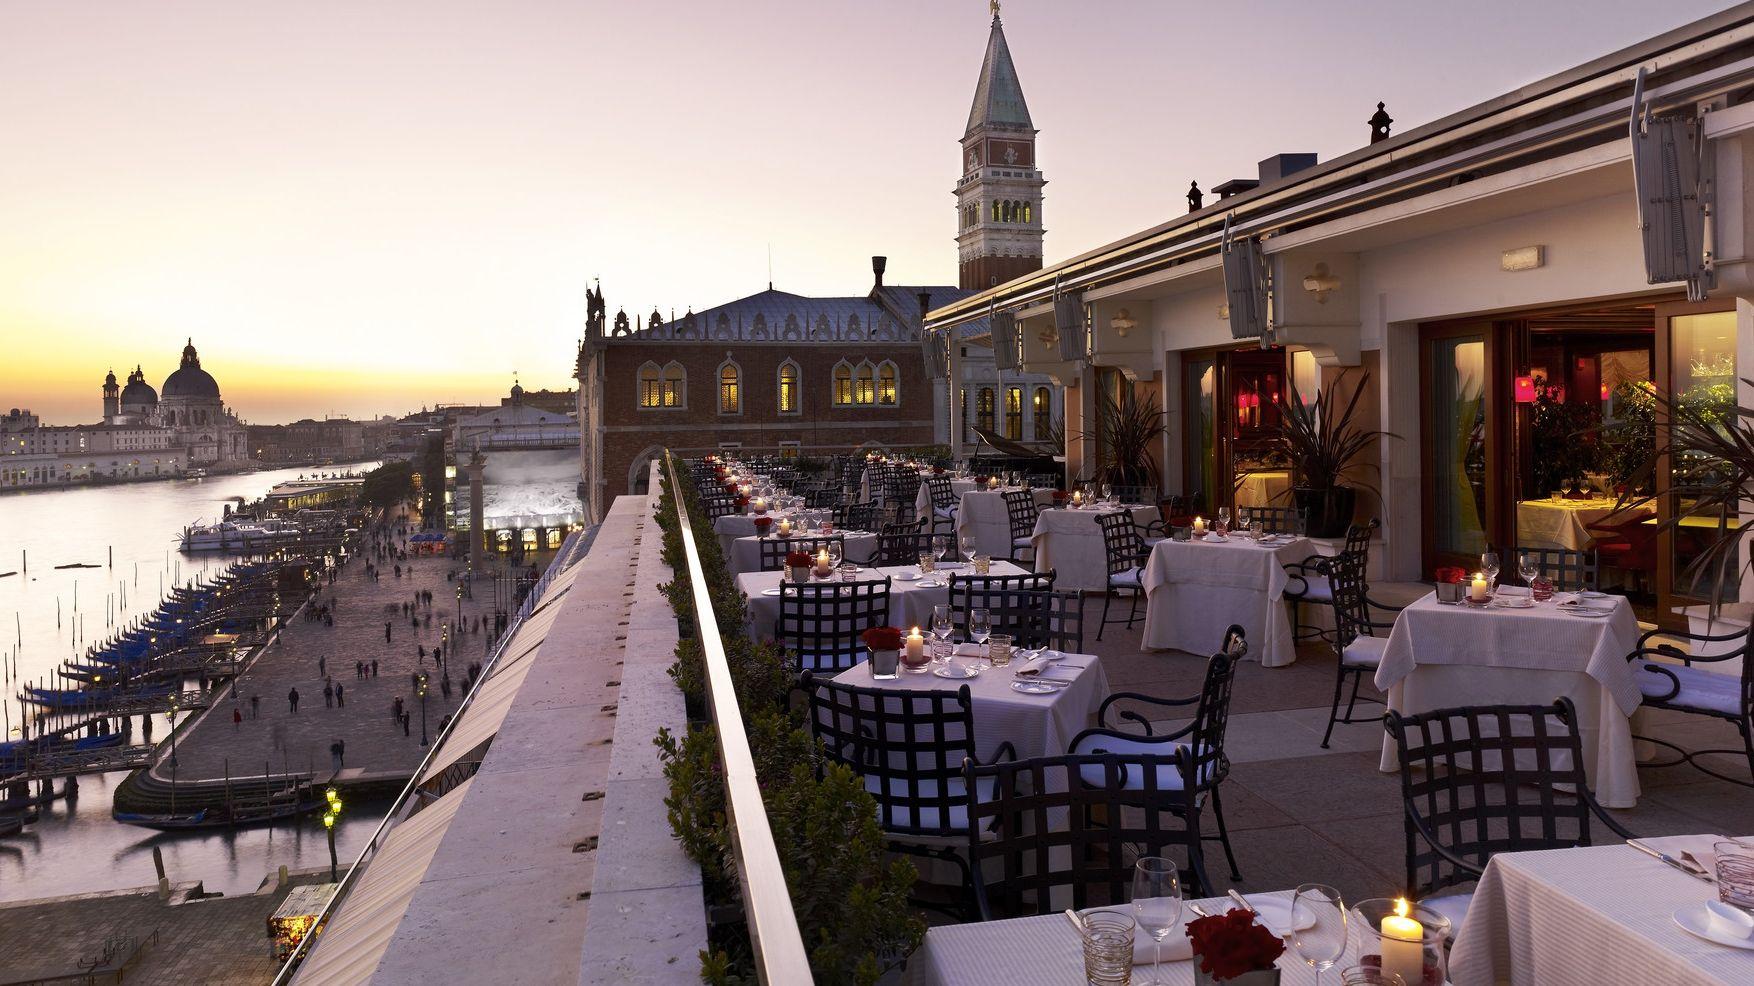 Terrazza Danieli Restaurant / Lunch or Dinner | Italy 2017 ...